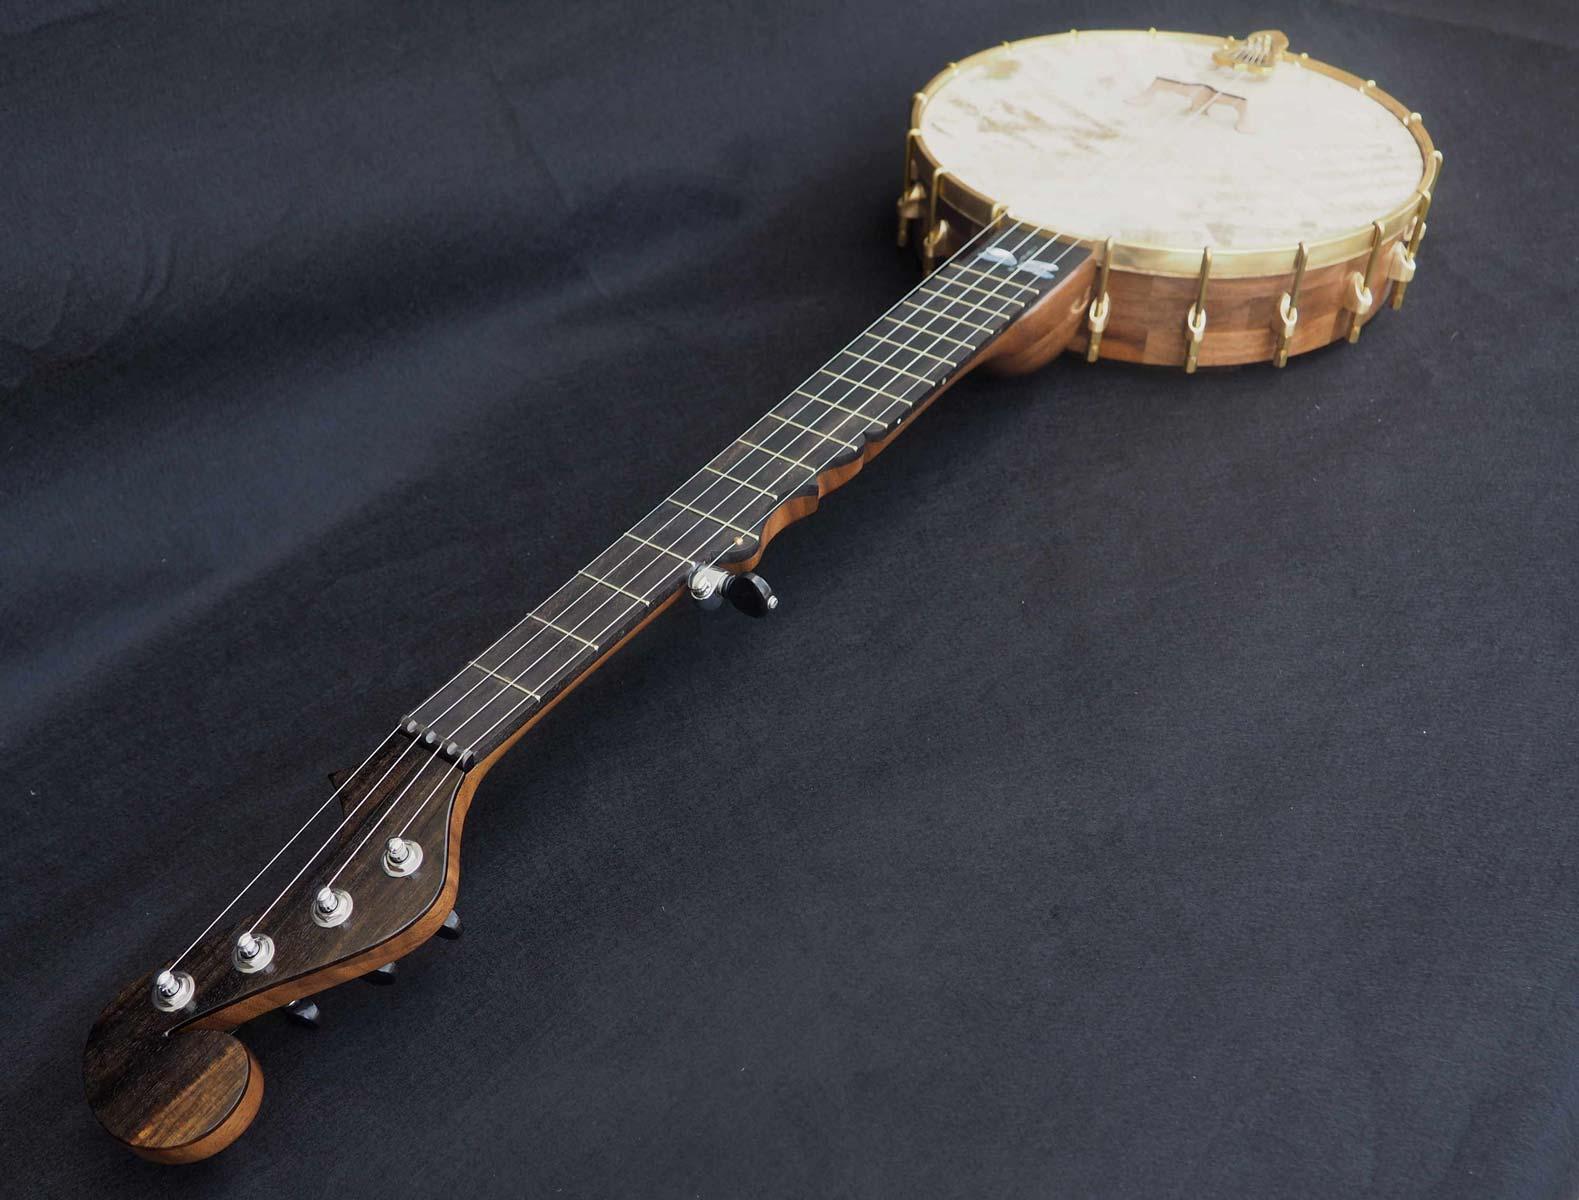 Dragonfly Inlay Banjo minstrel headstock